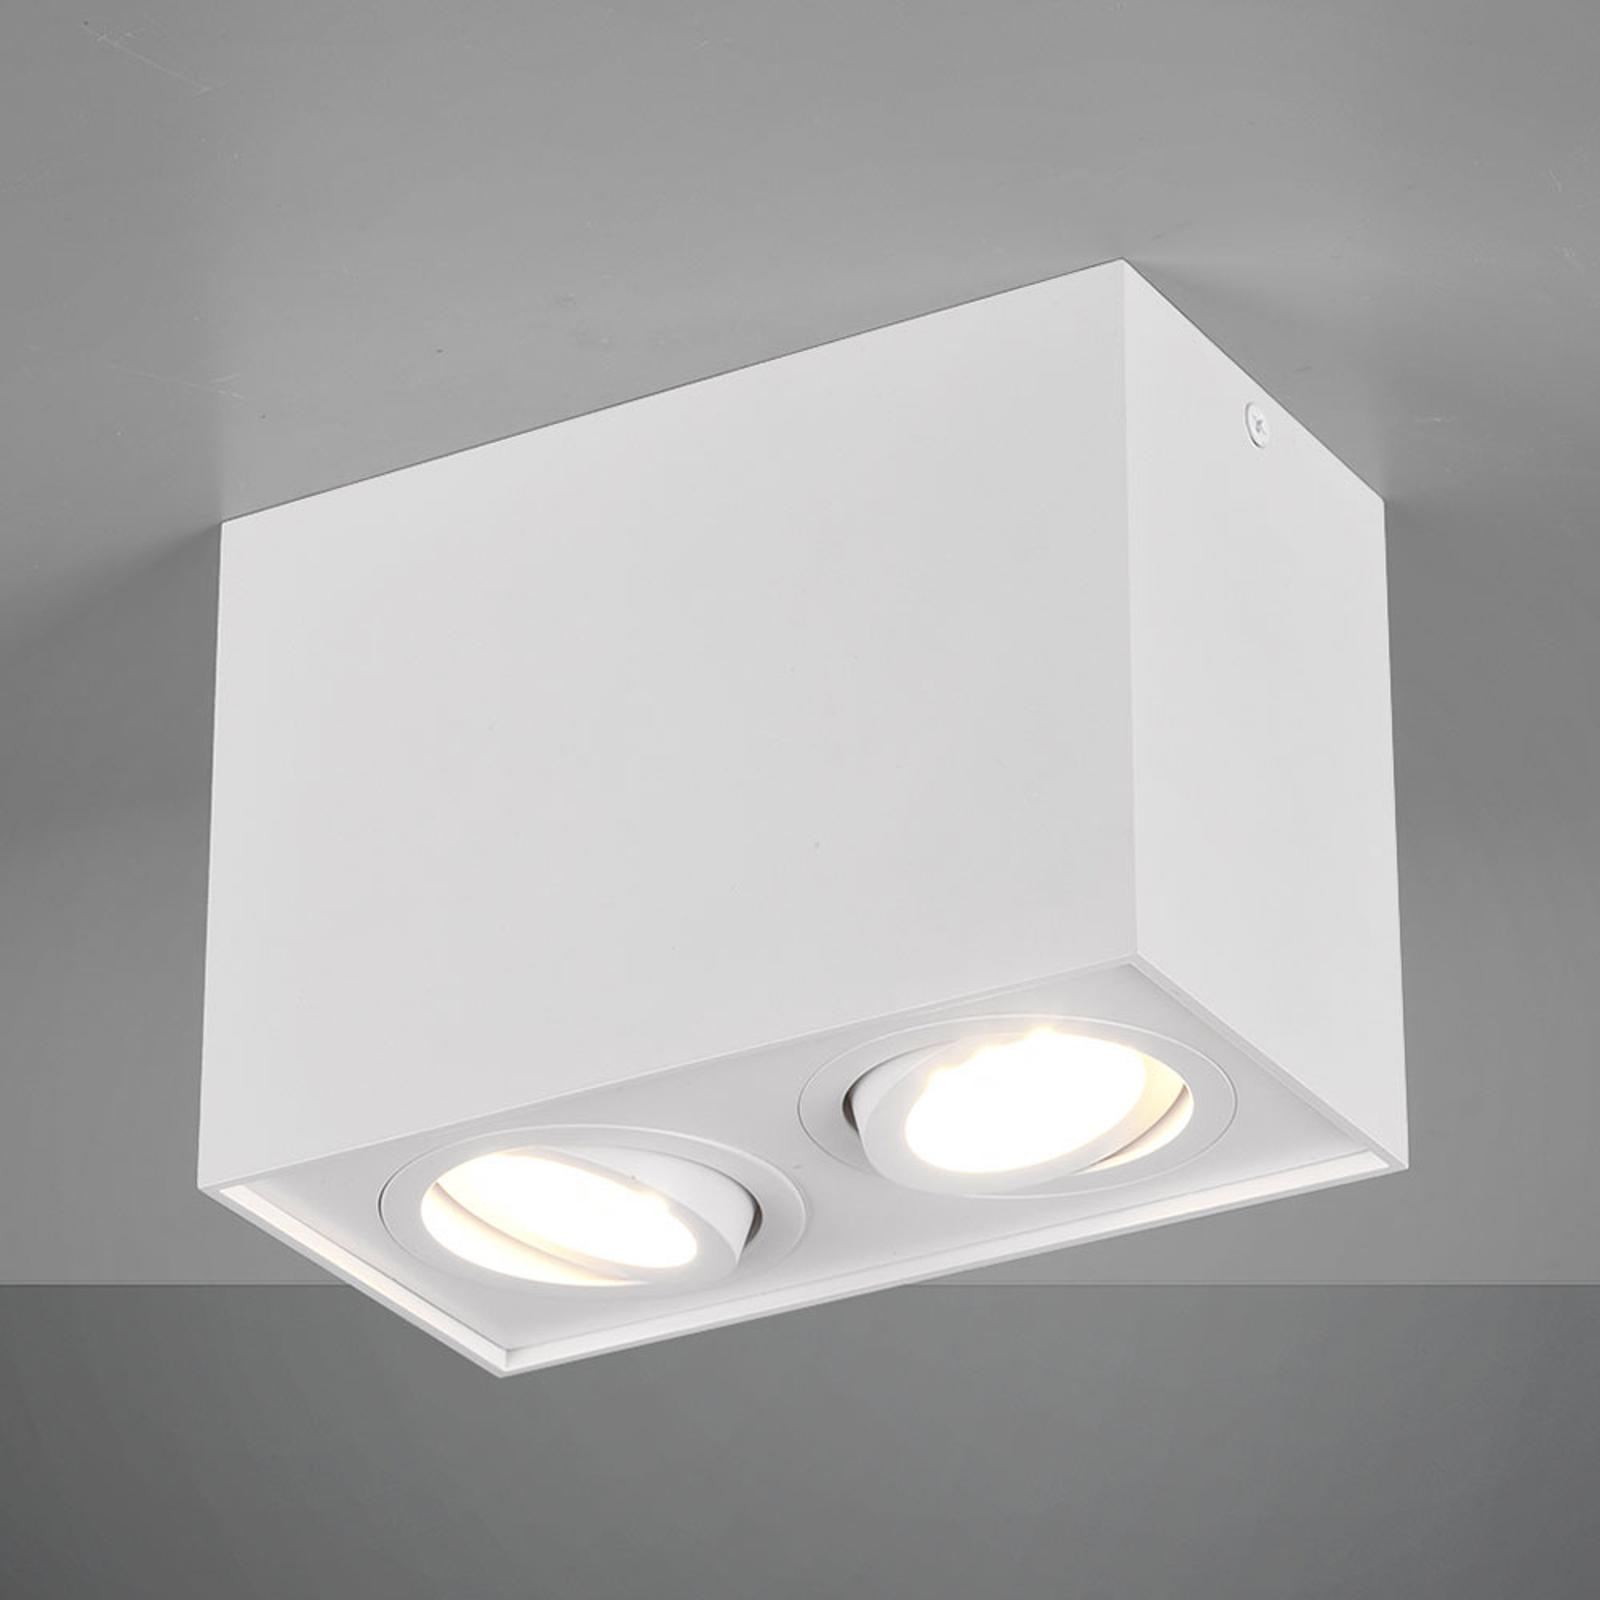 Plafondlamp Biscuit, 2-lamps, wit